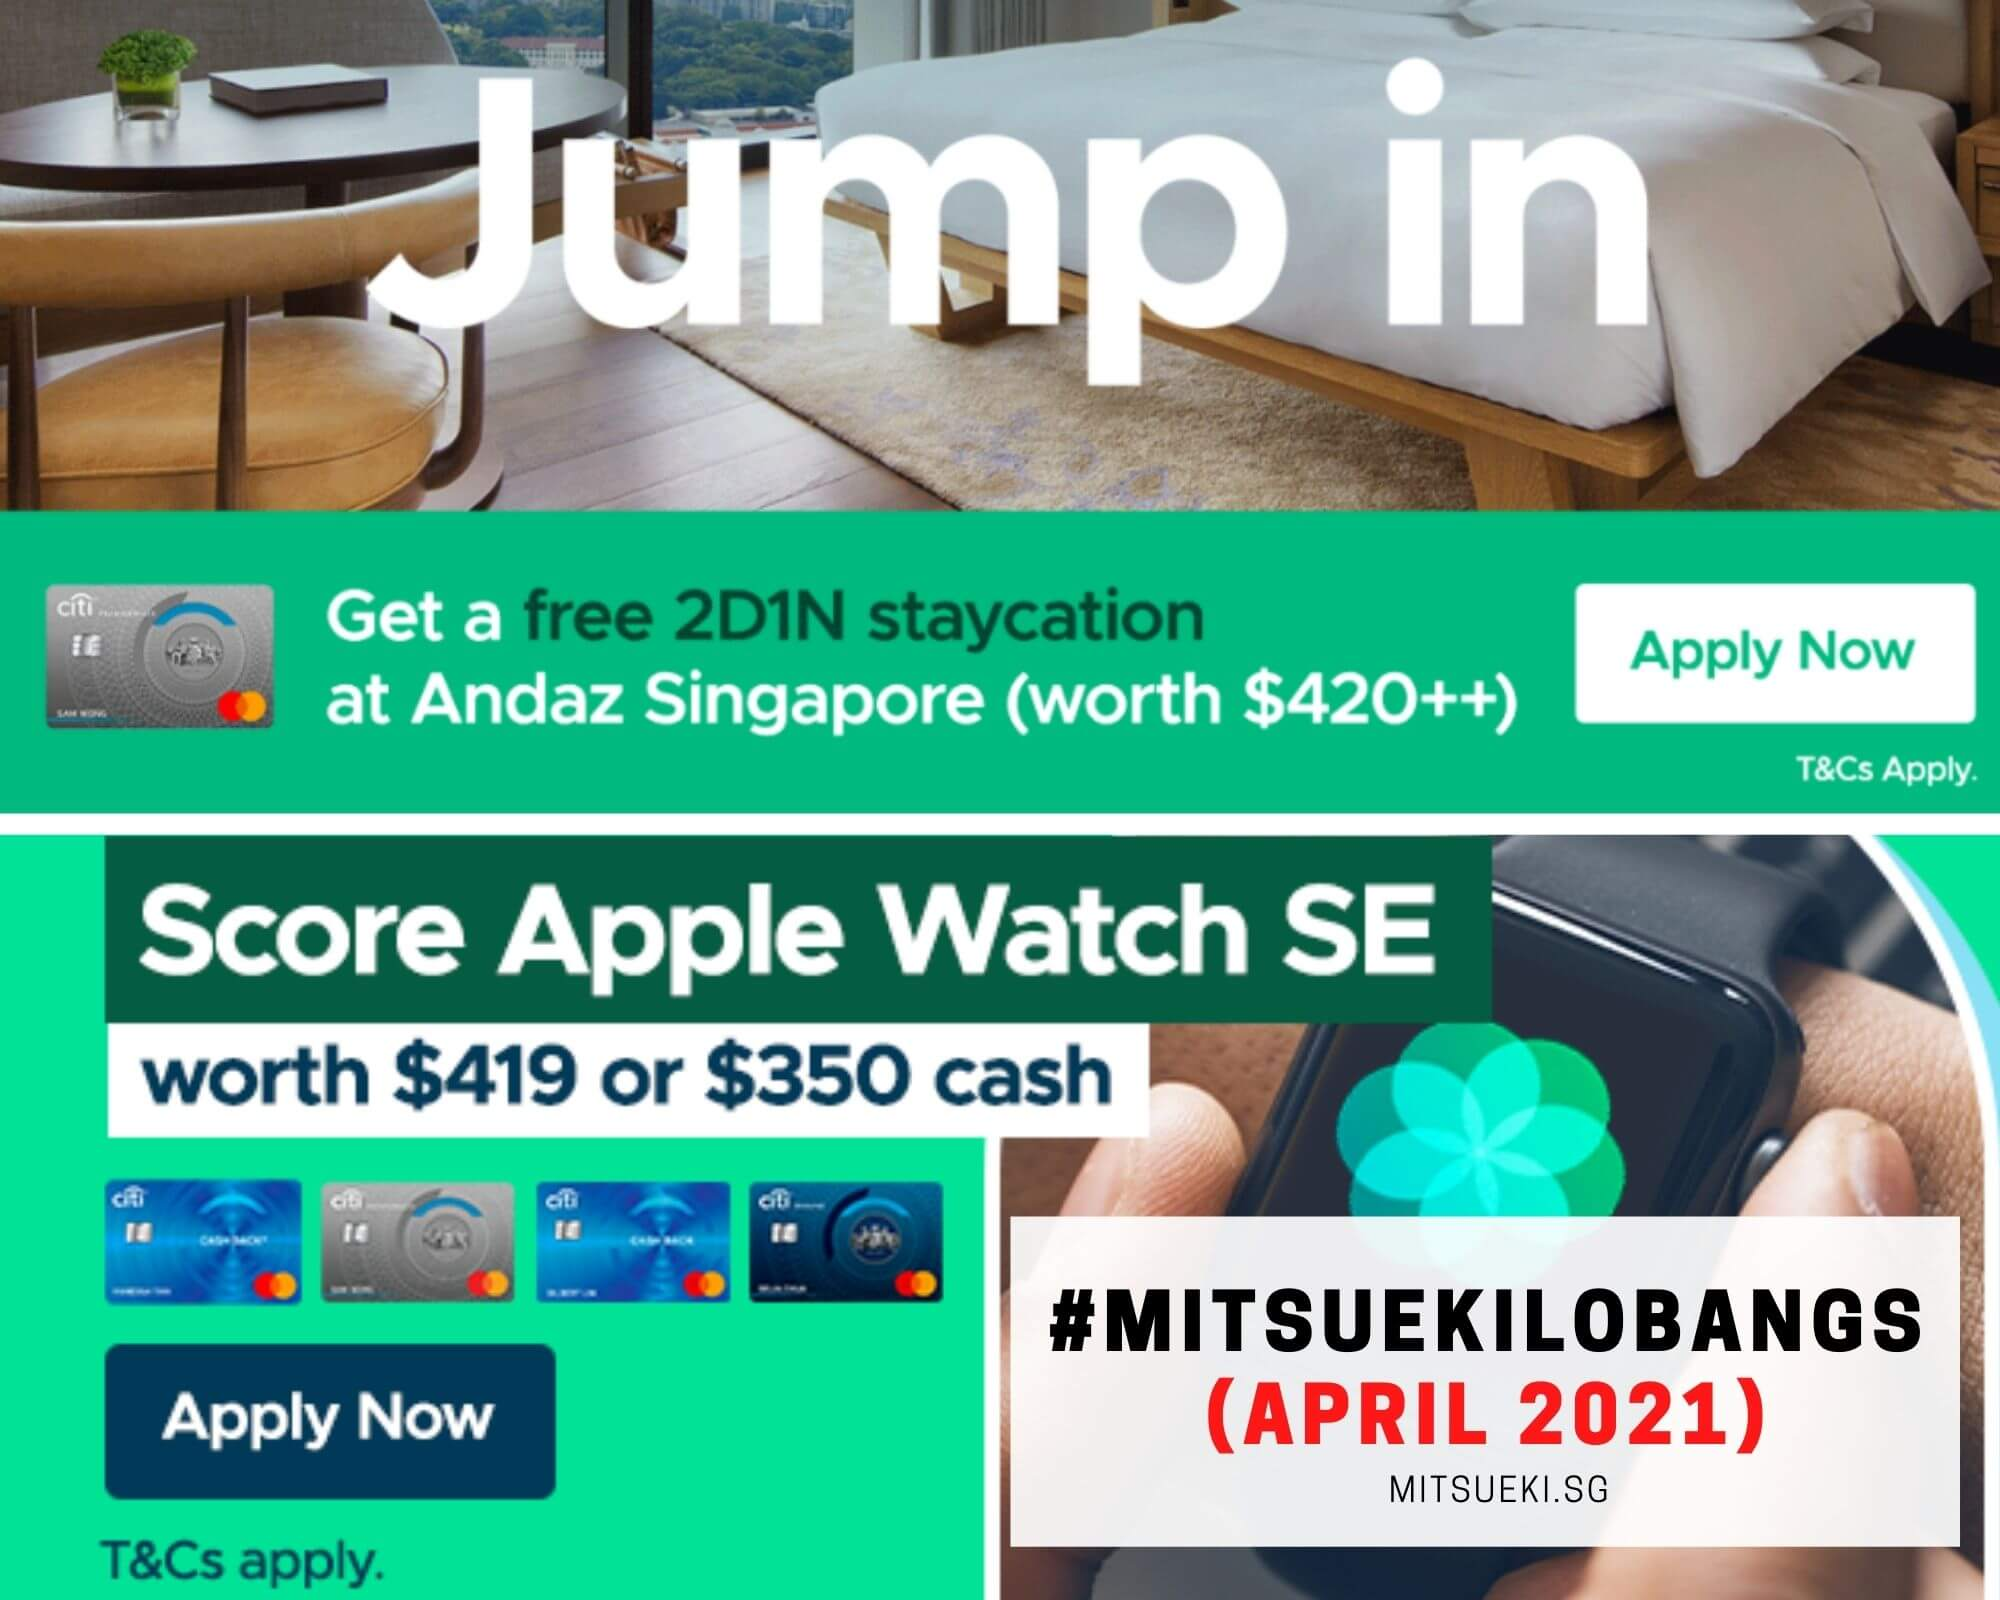 mitsueki lobang april 2021_V4